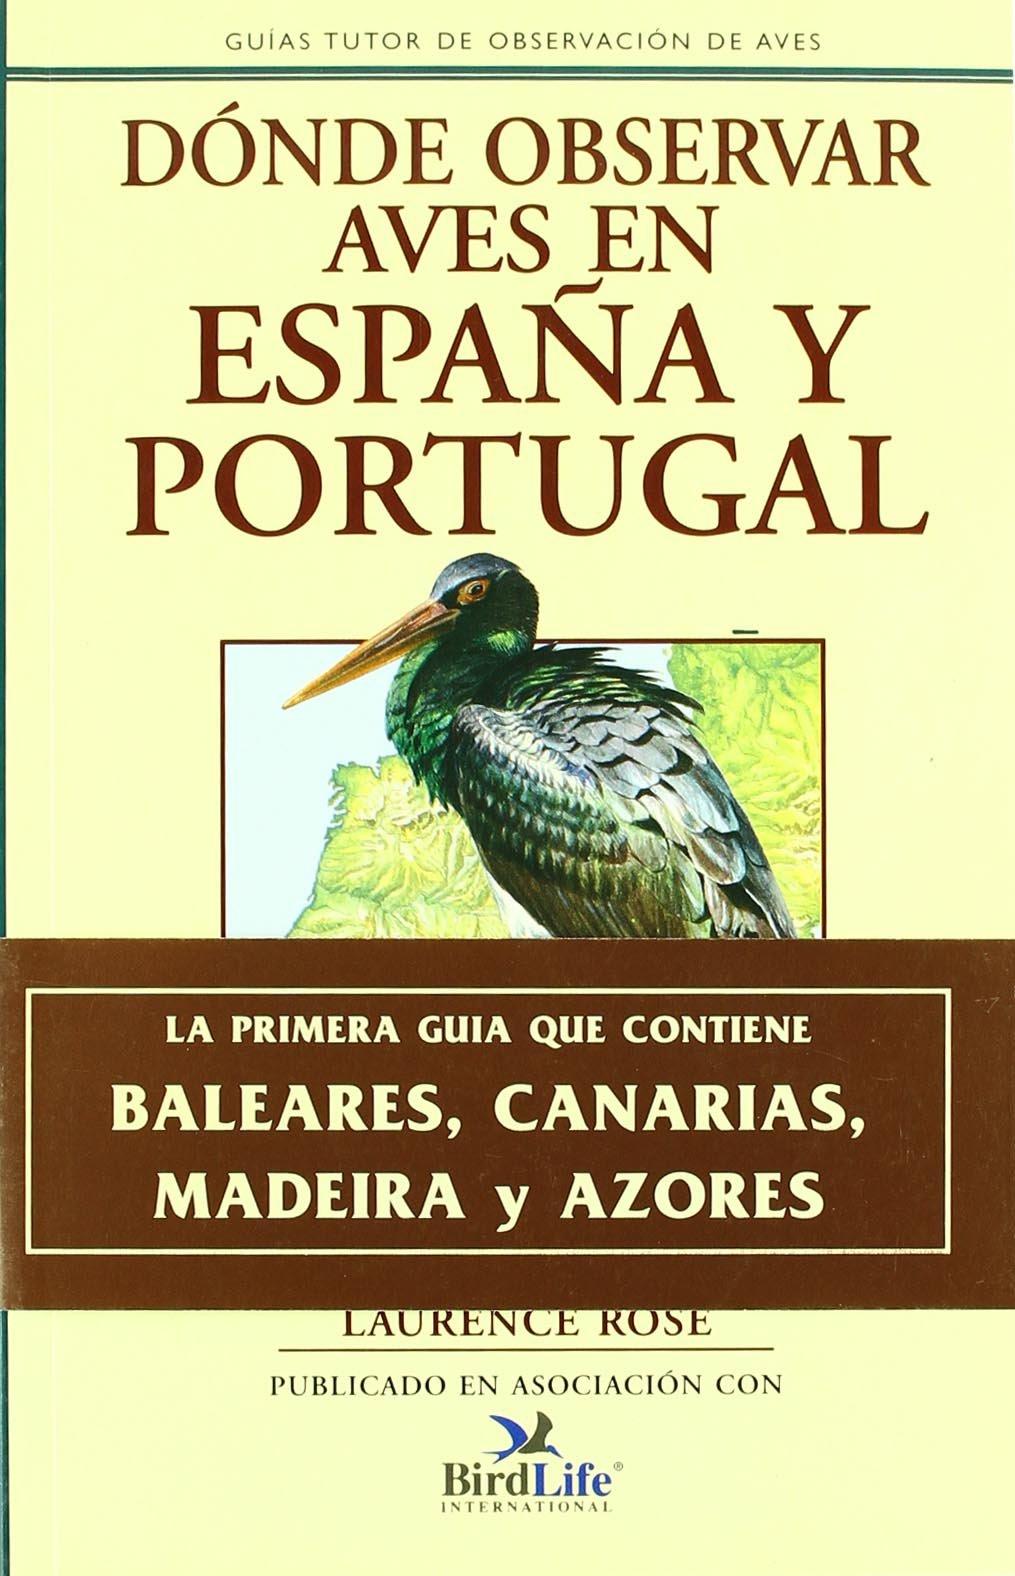 Guía Tutor de observación de aves, Dónde observar aves en España y ...